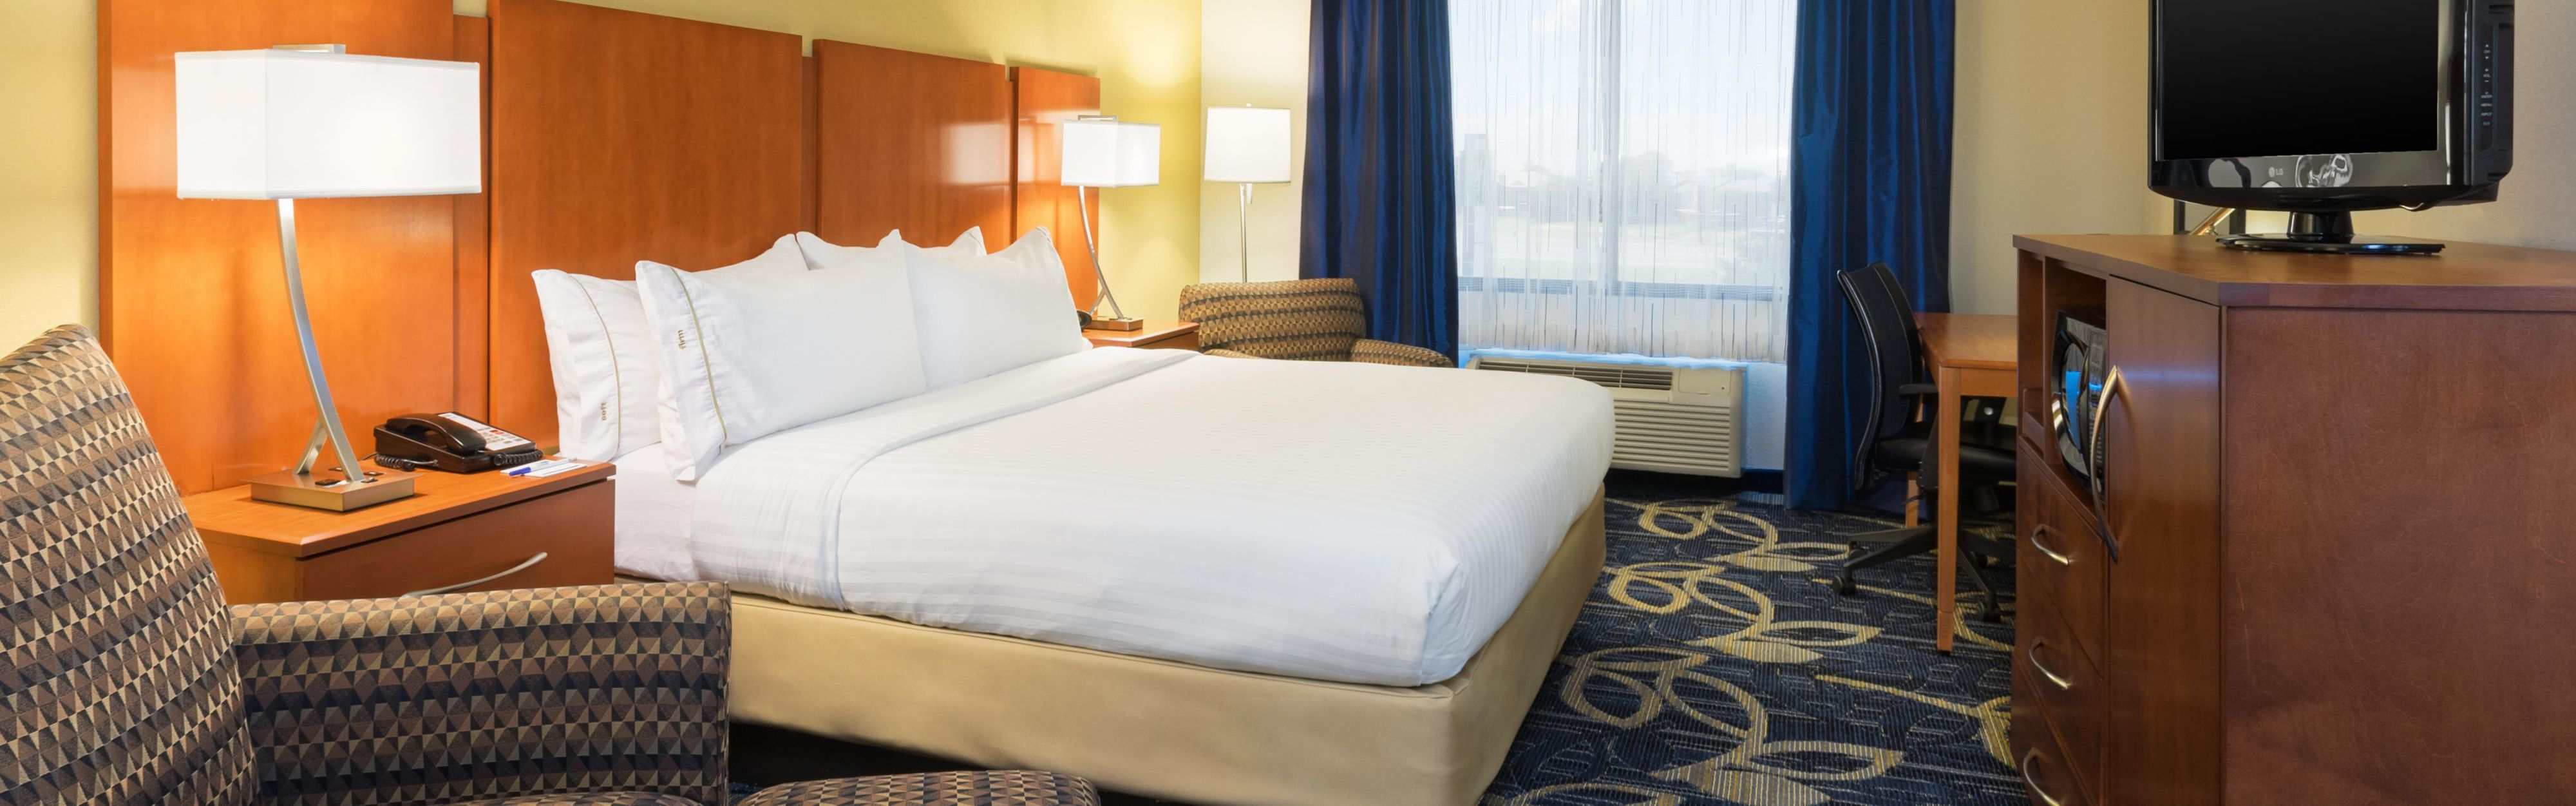 Holiday Inn Express Midland Loop 250 image 1